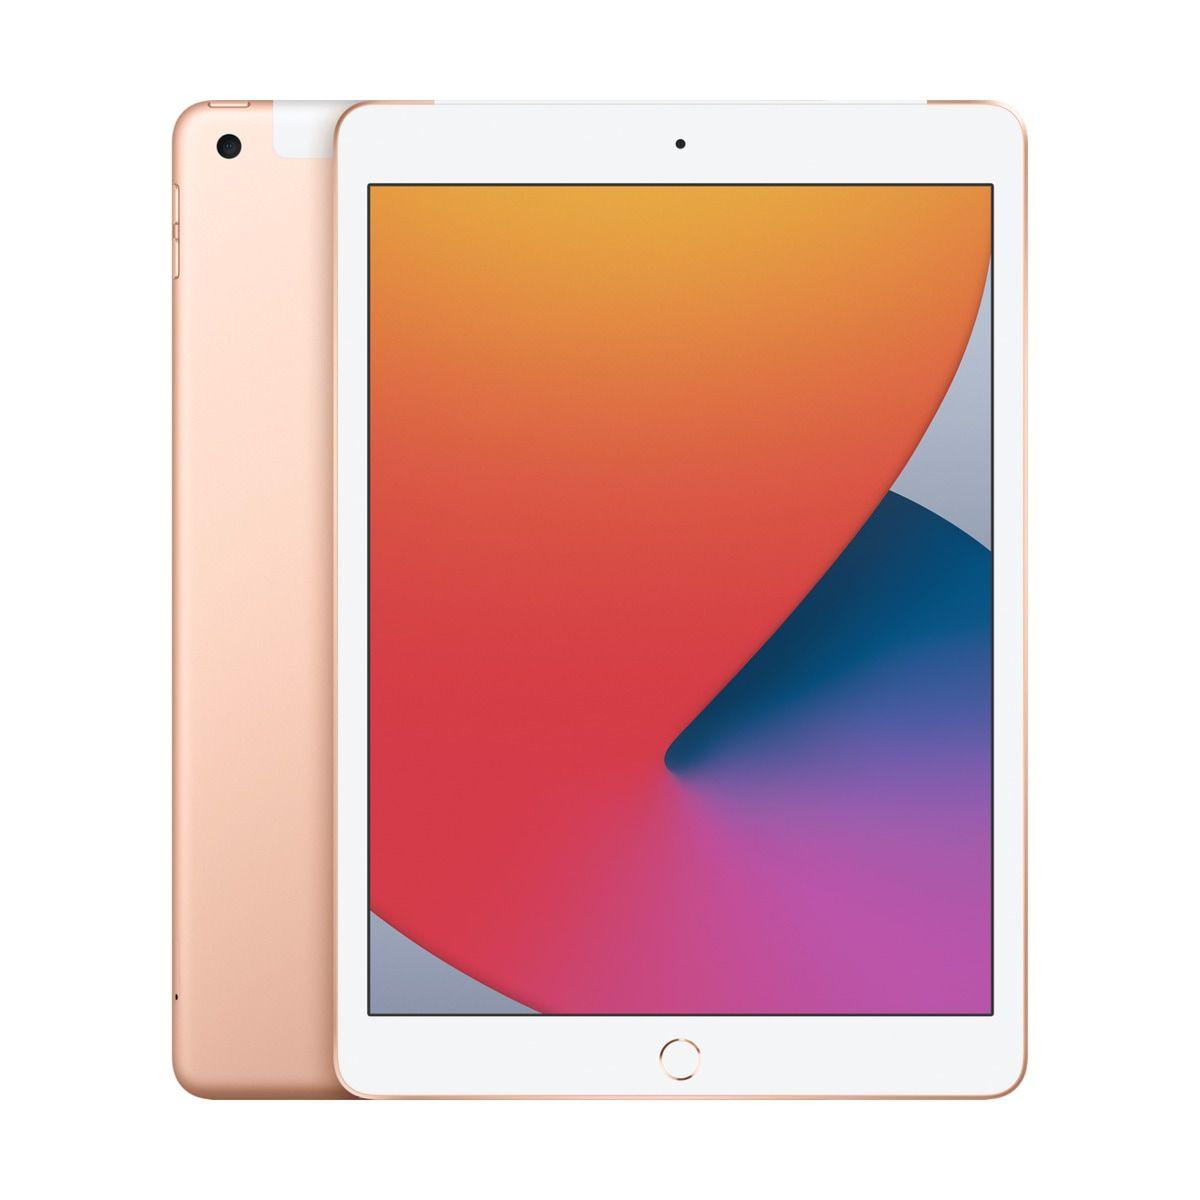 Apple iPad Wi-Fi + Cell 128GB - Gold / SK